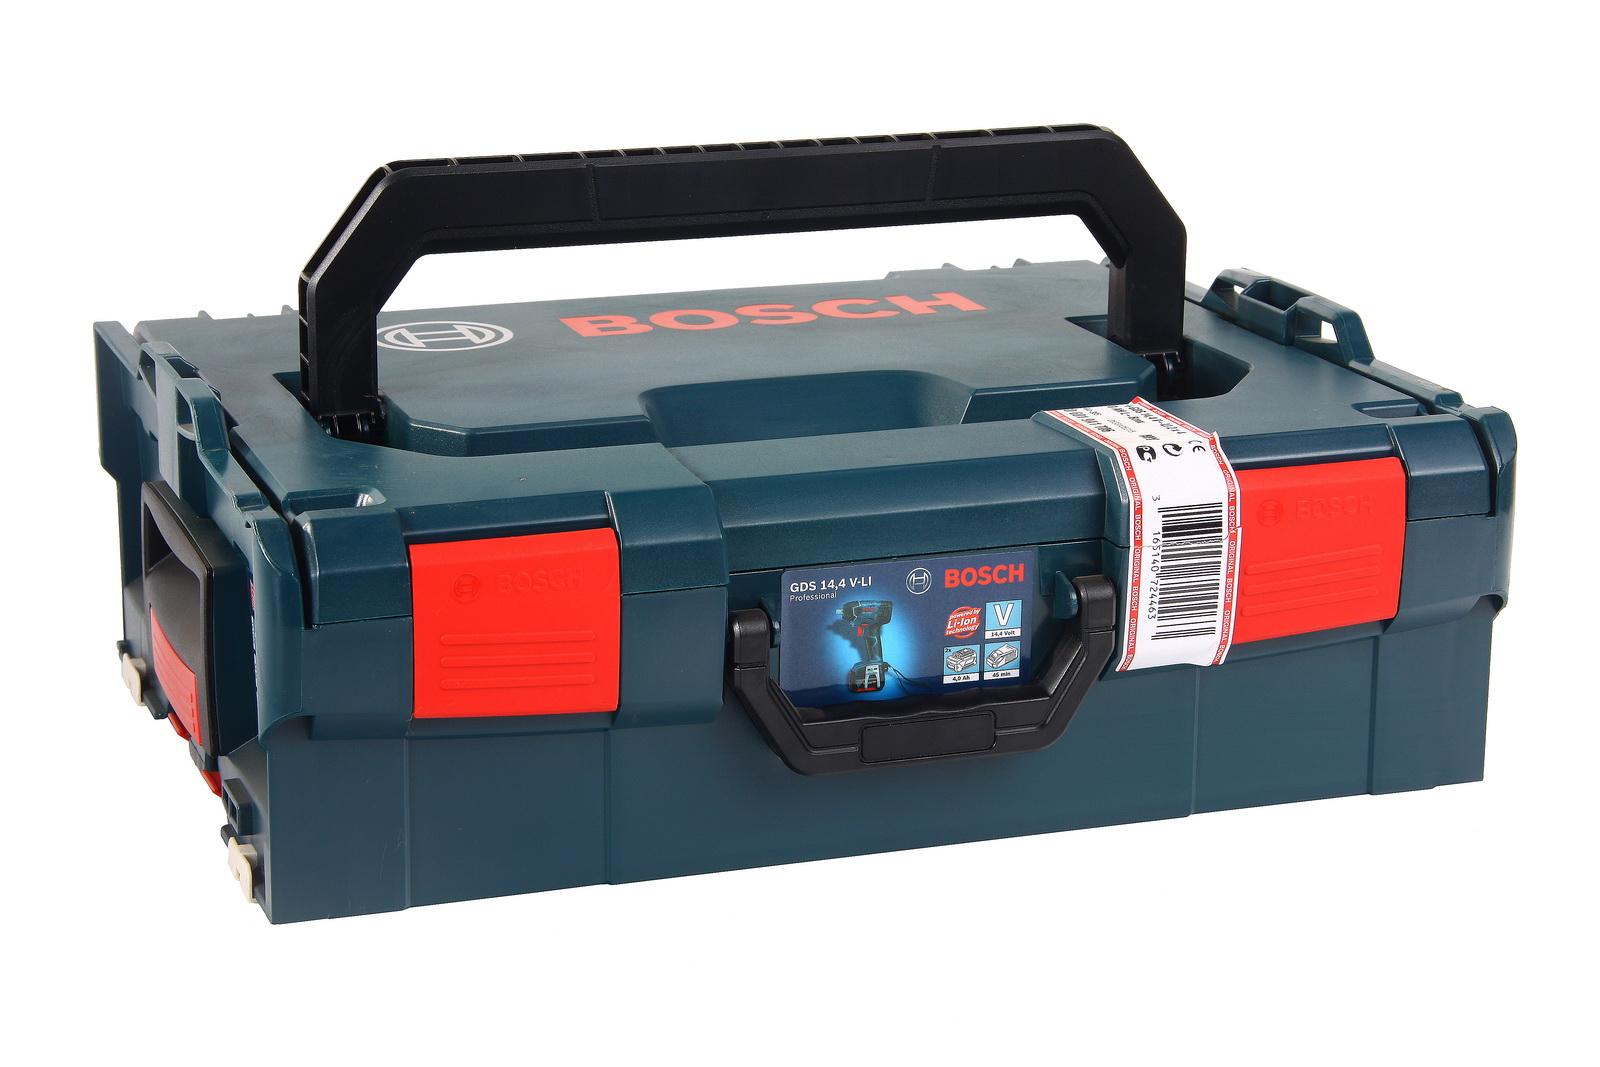 Ударный аккумуляторный гайковерт Bosch Gds 14,4 v-li 4.0Ач (0.601.9a1.t06)